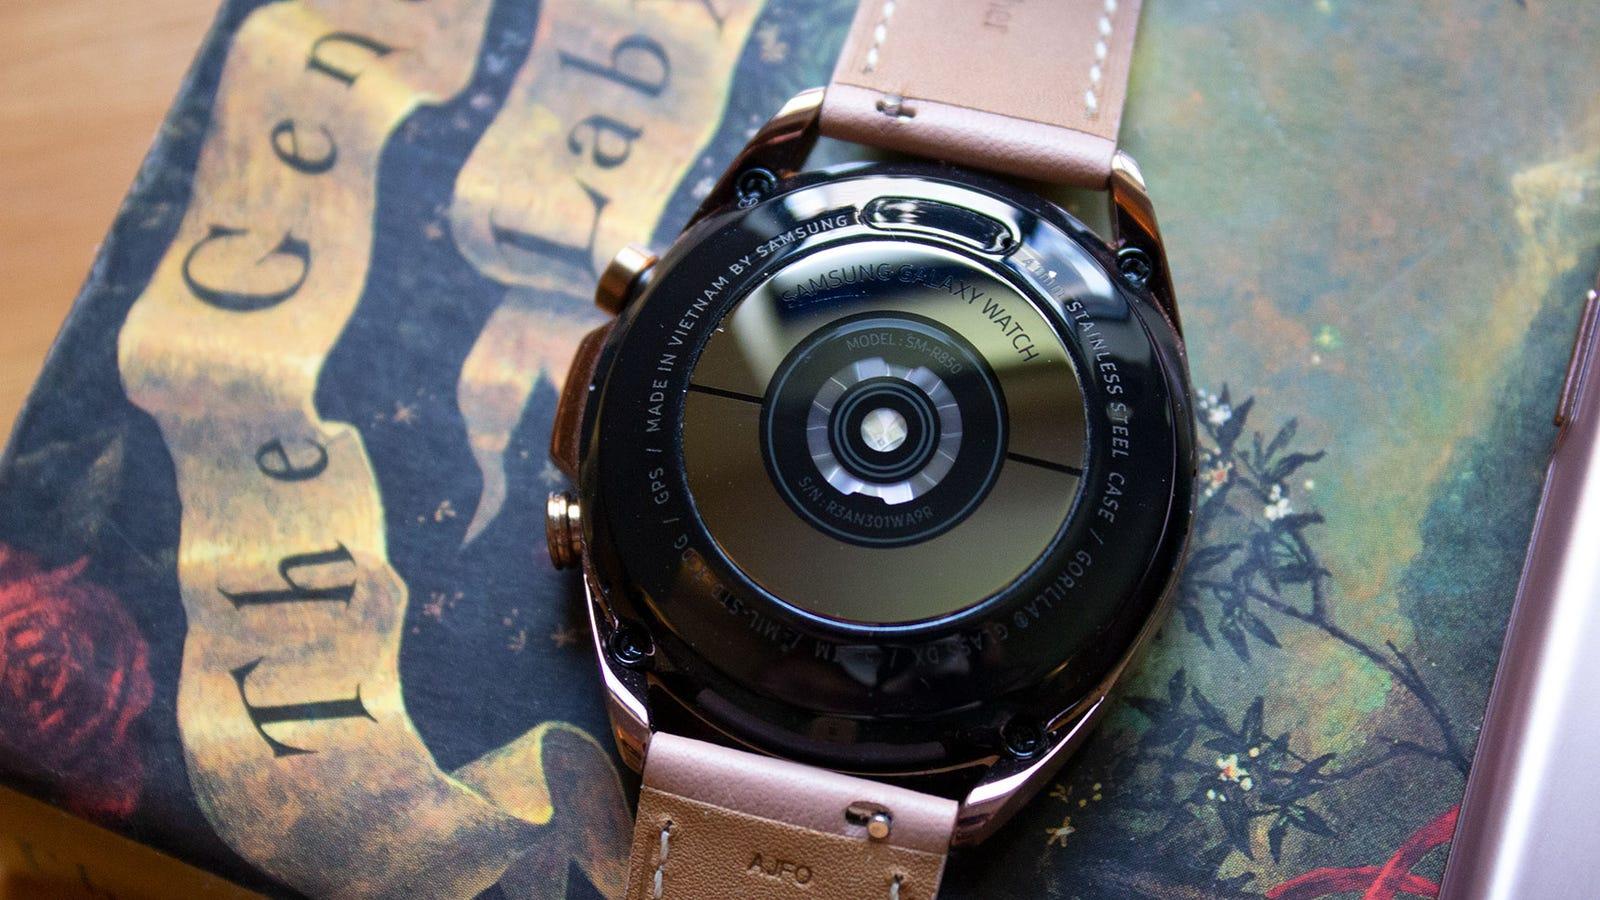 Samsung Galaxy Watch 3 ساعت هوشمندی که منتظر آن بودیم